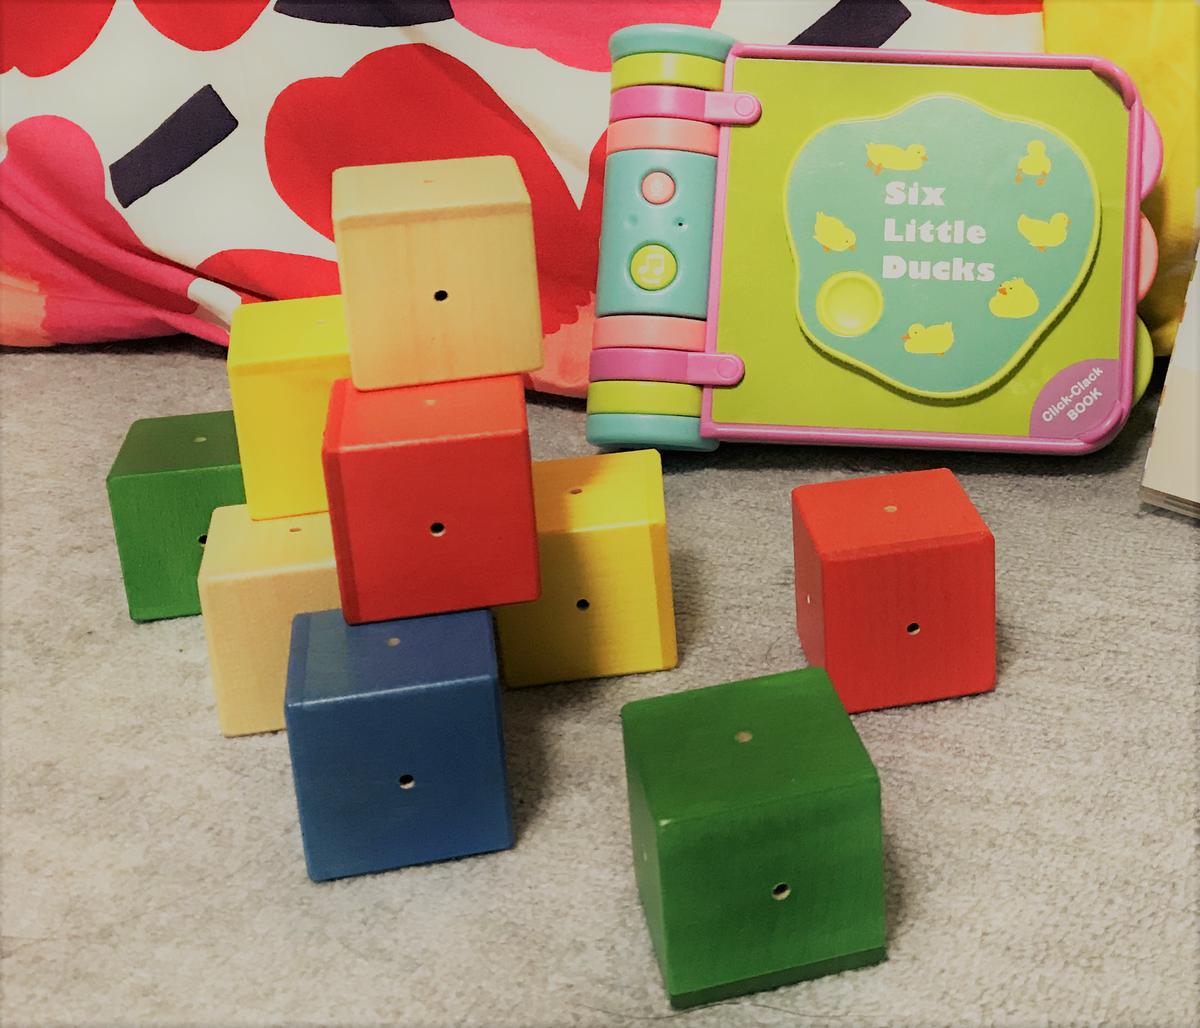 Musical building blocks